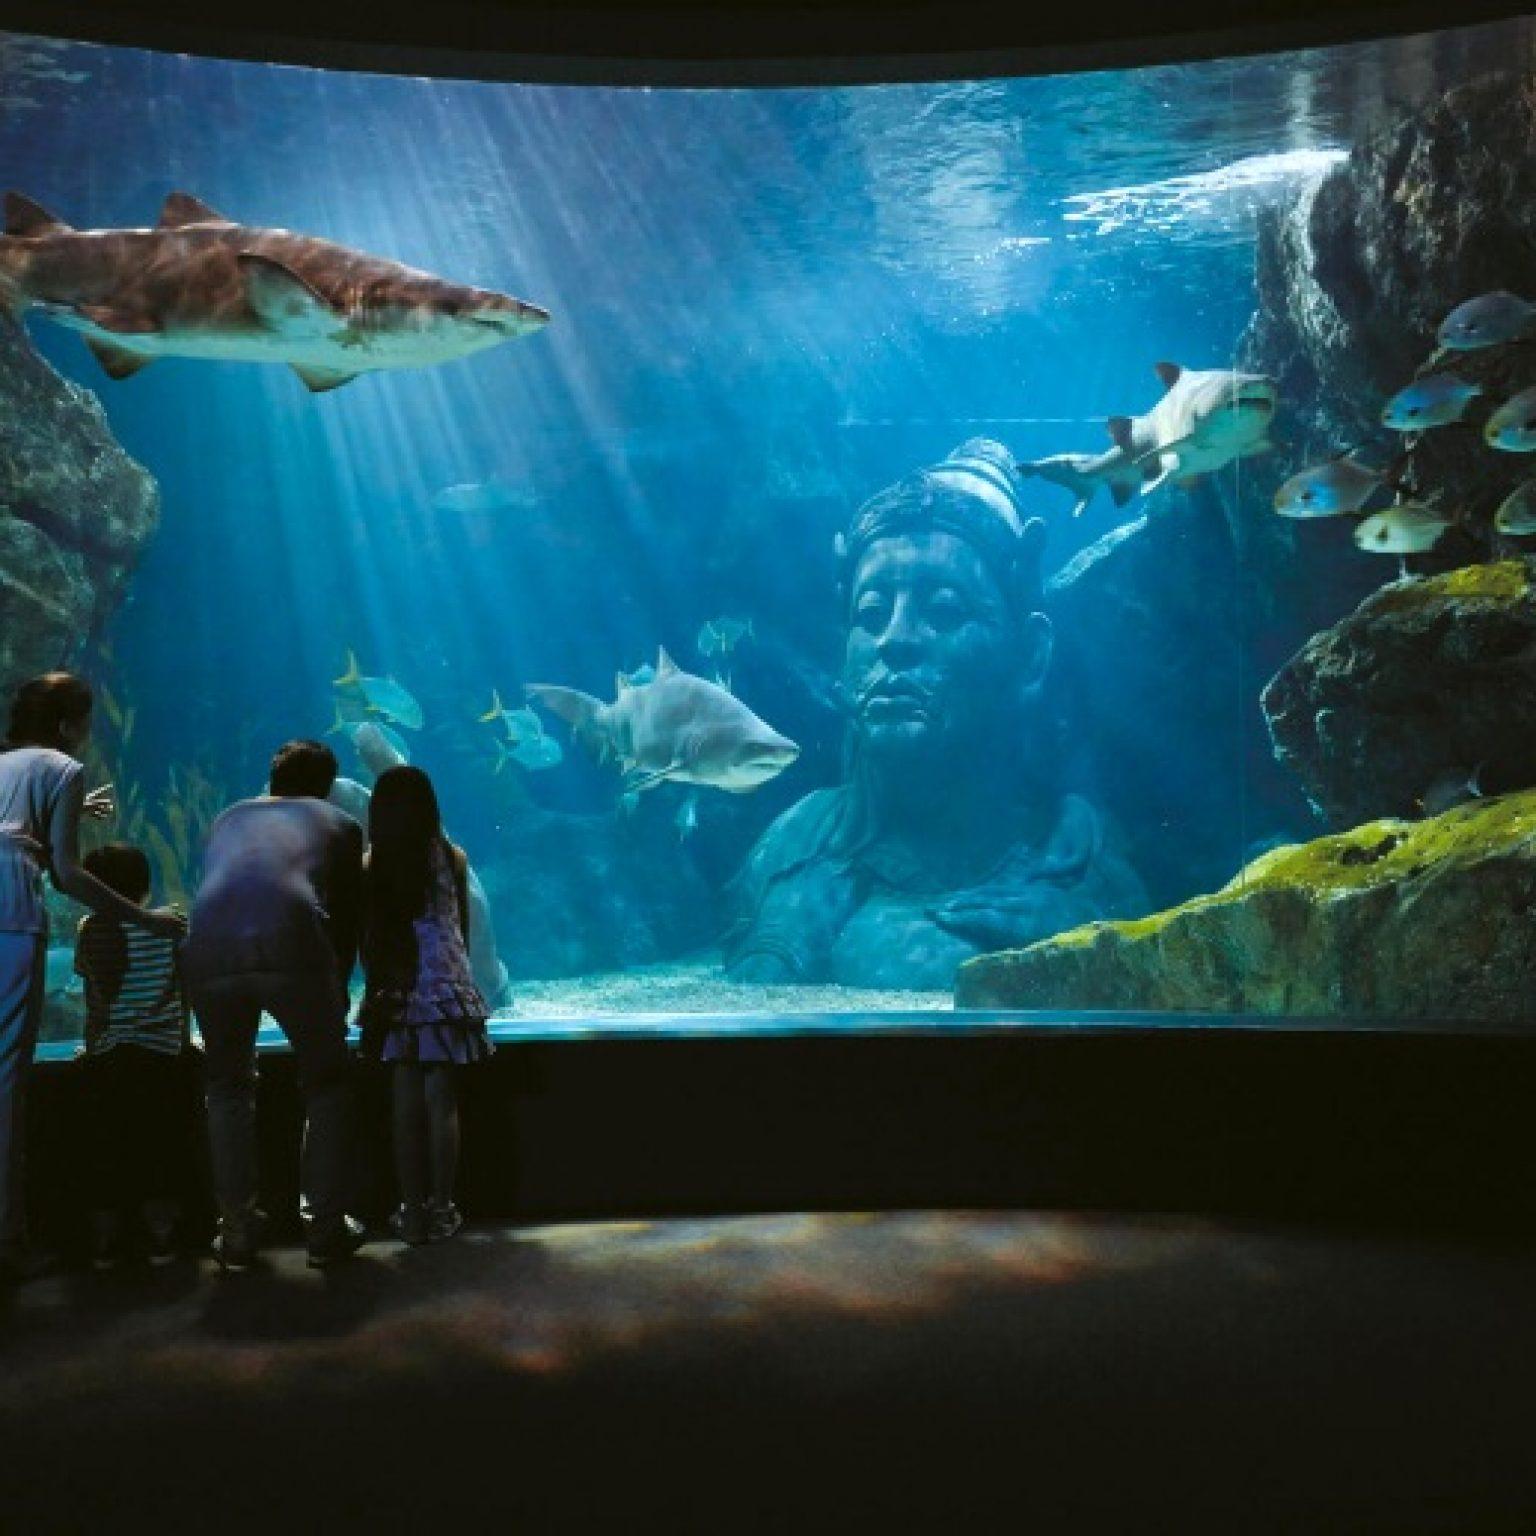 Attractions in Bangkok: Siam Ocean World Aquarium